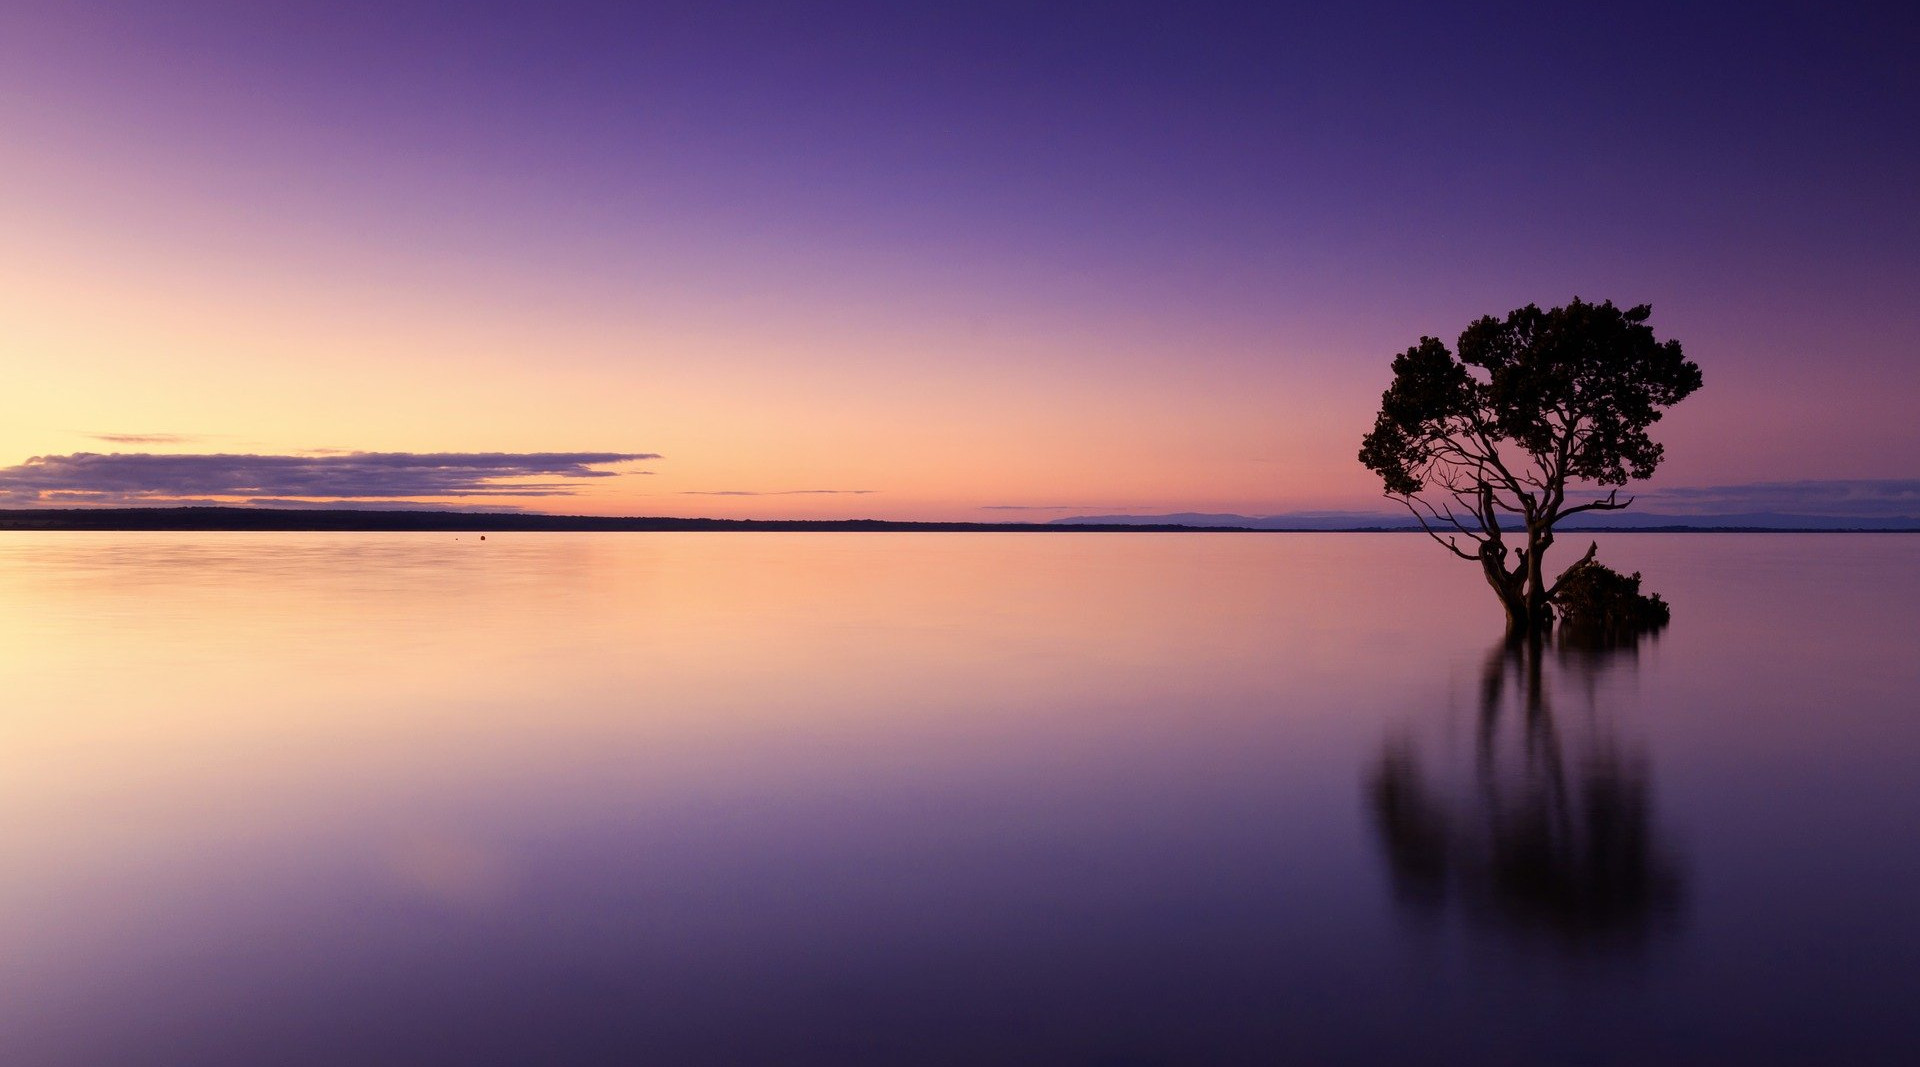 Pittoresker Sonnenuntergang am Wasser